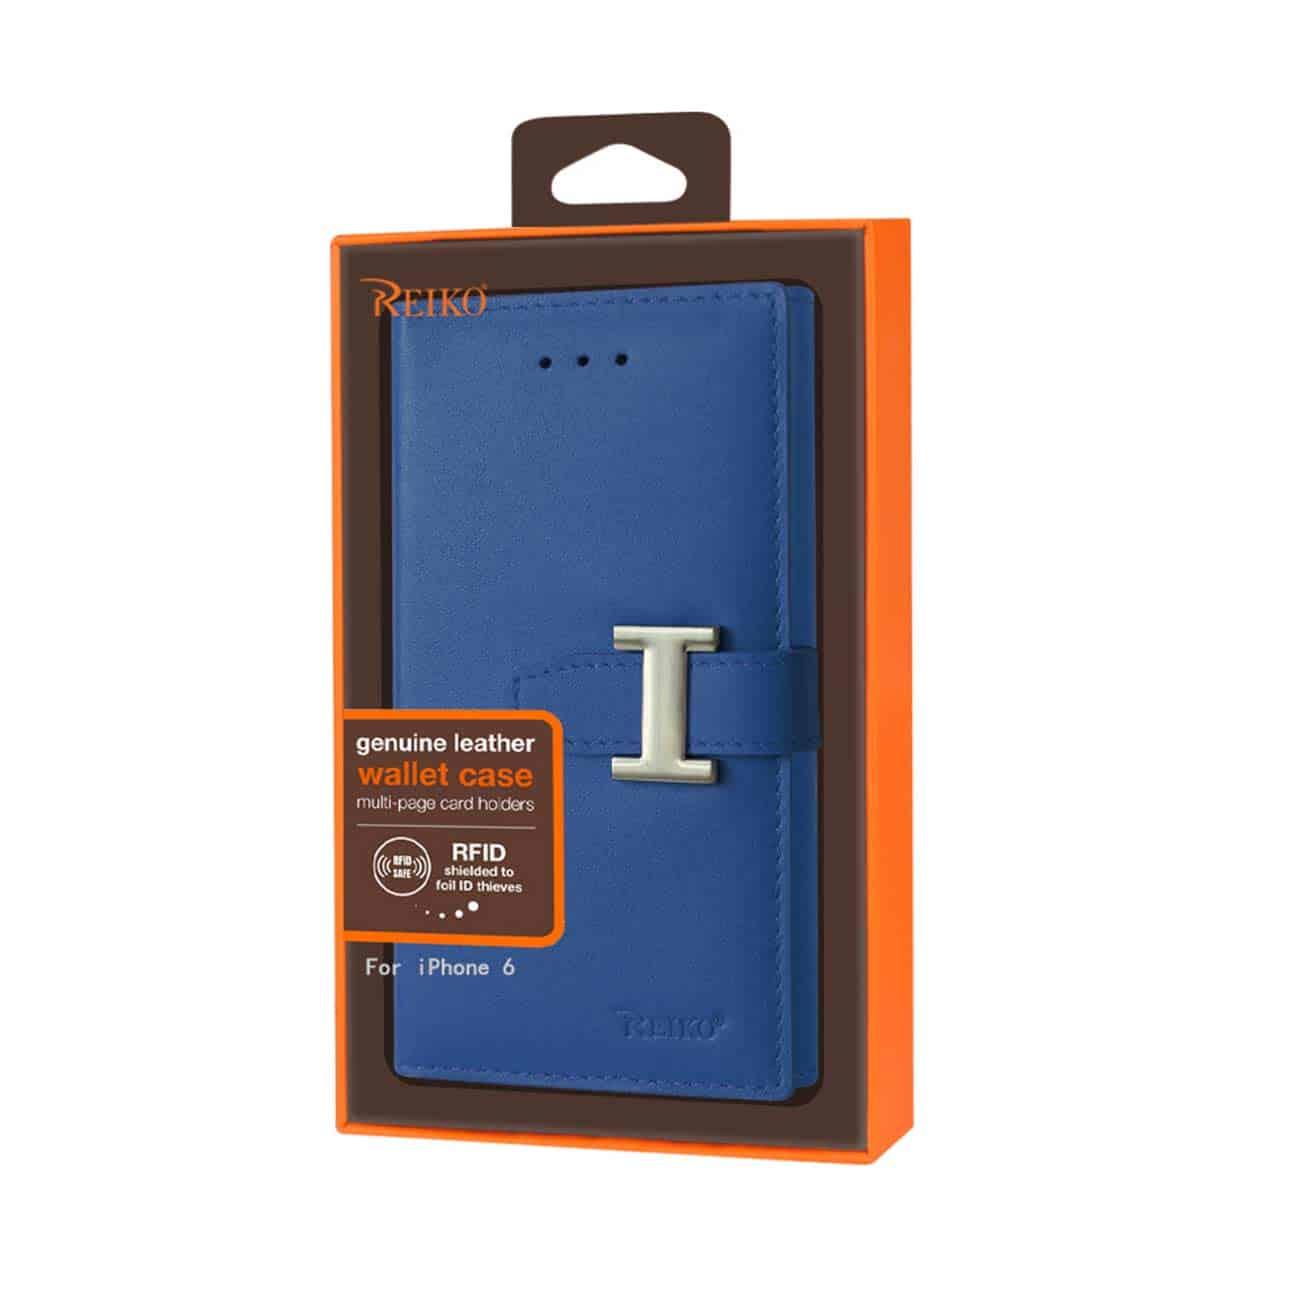 IPHONE 6 GENUINE LEATHER RFID WALLET CASE IN ULTRAMARINE